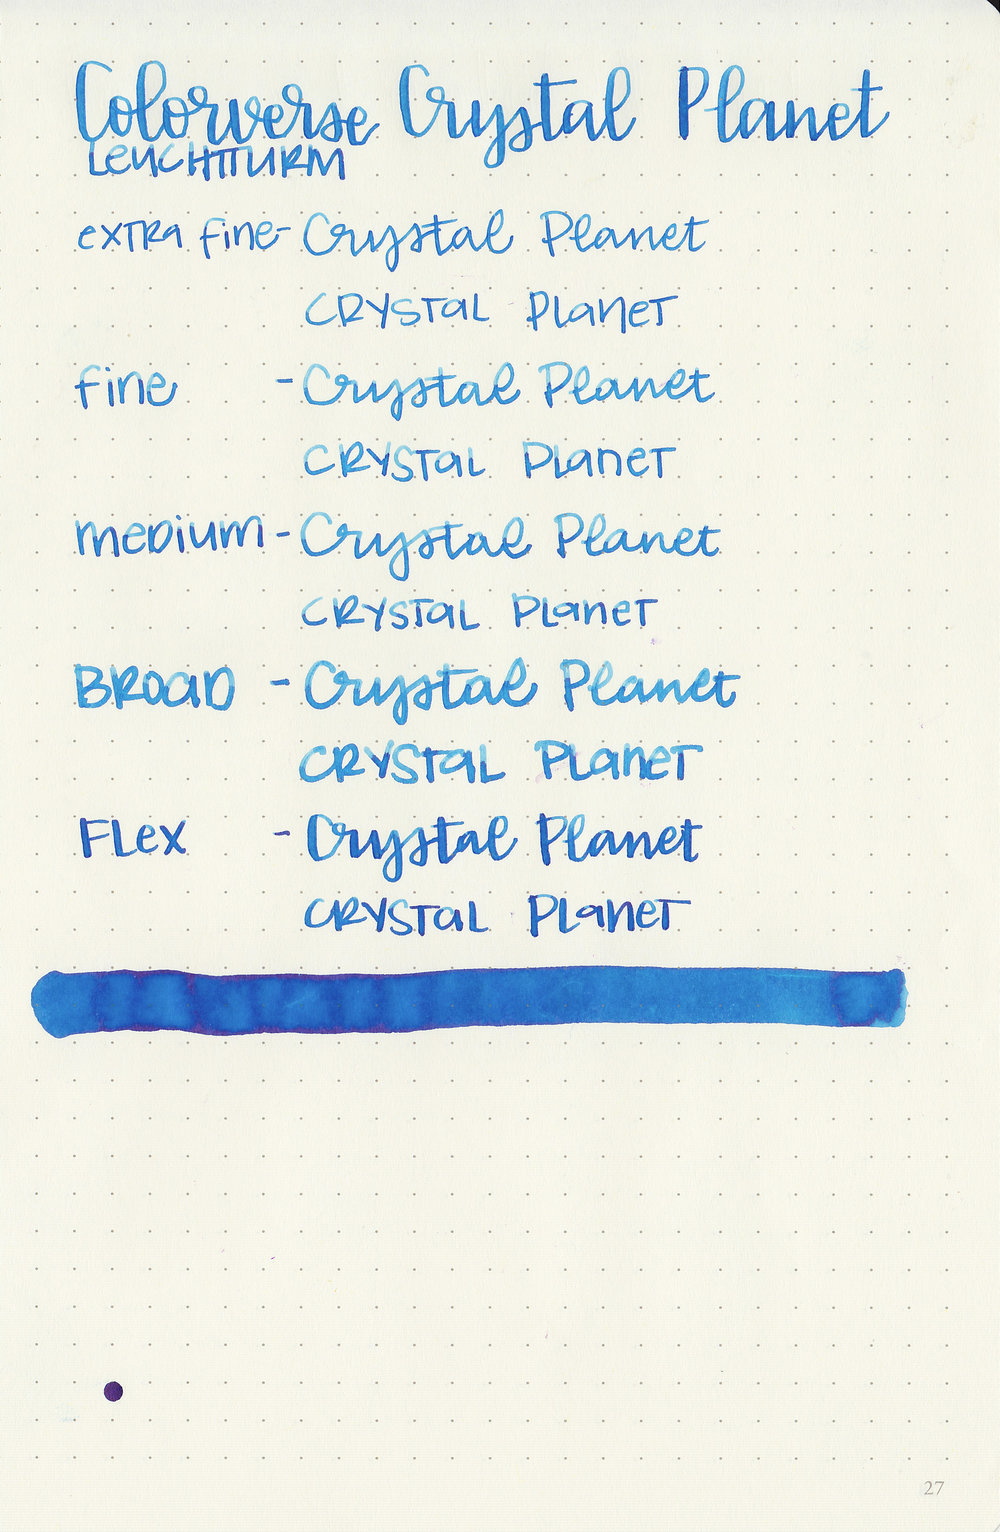 cv-crystal-planet-9.jpg